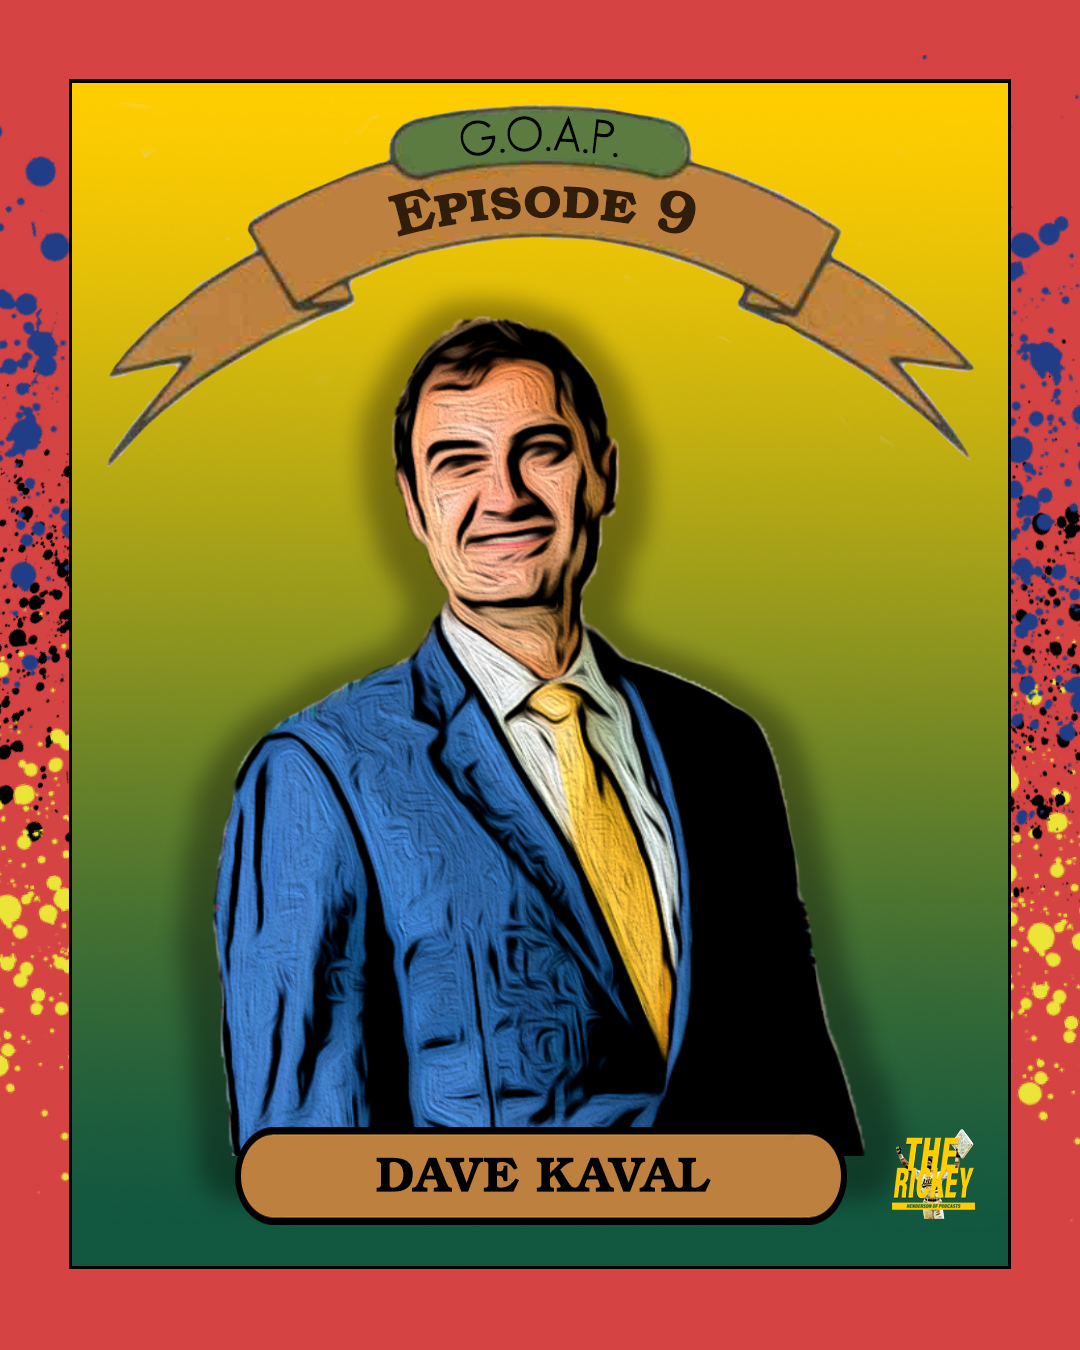 DK-KAVAL